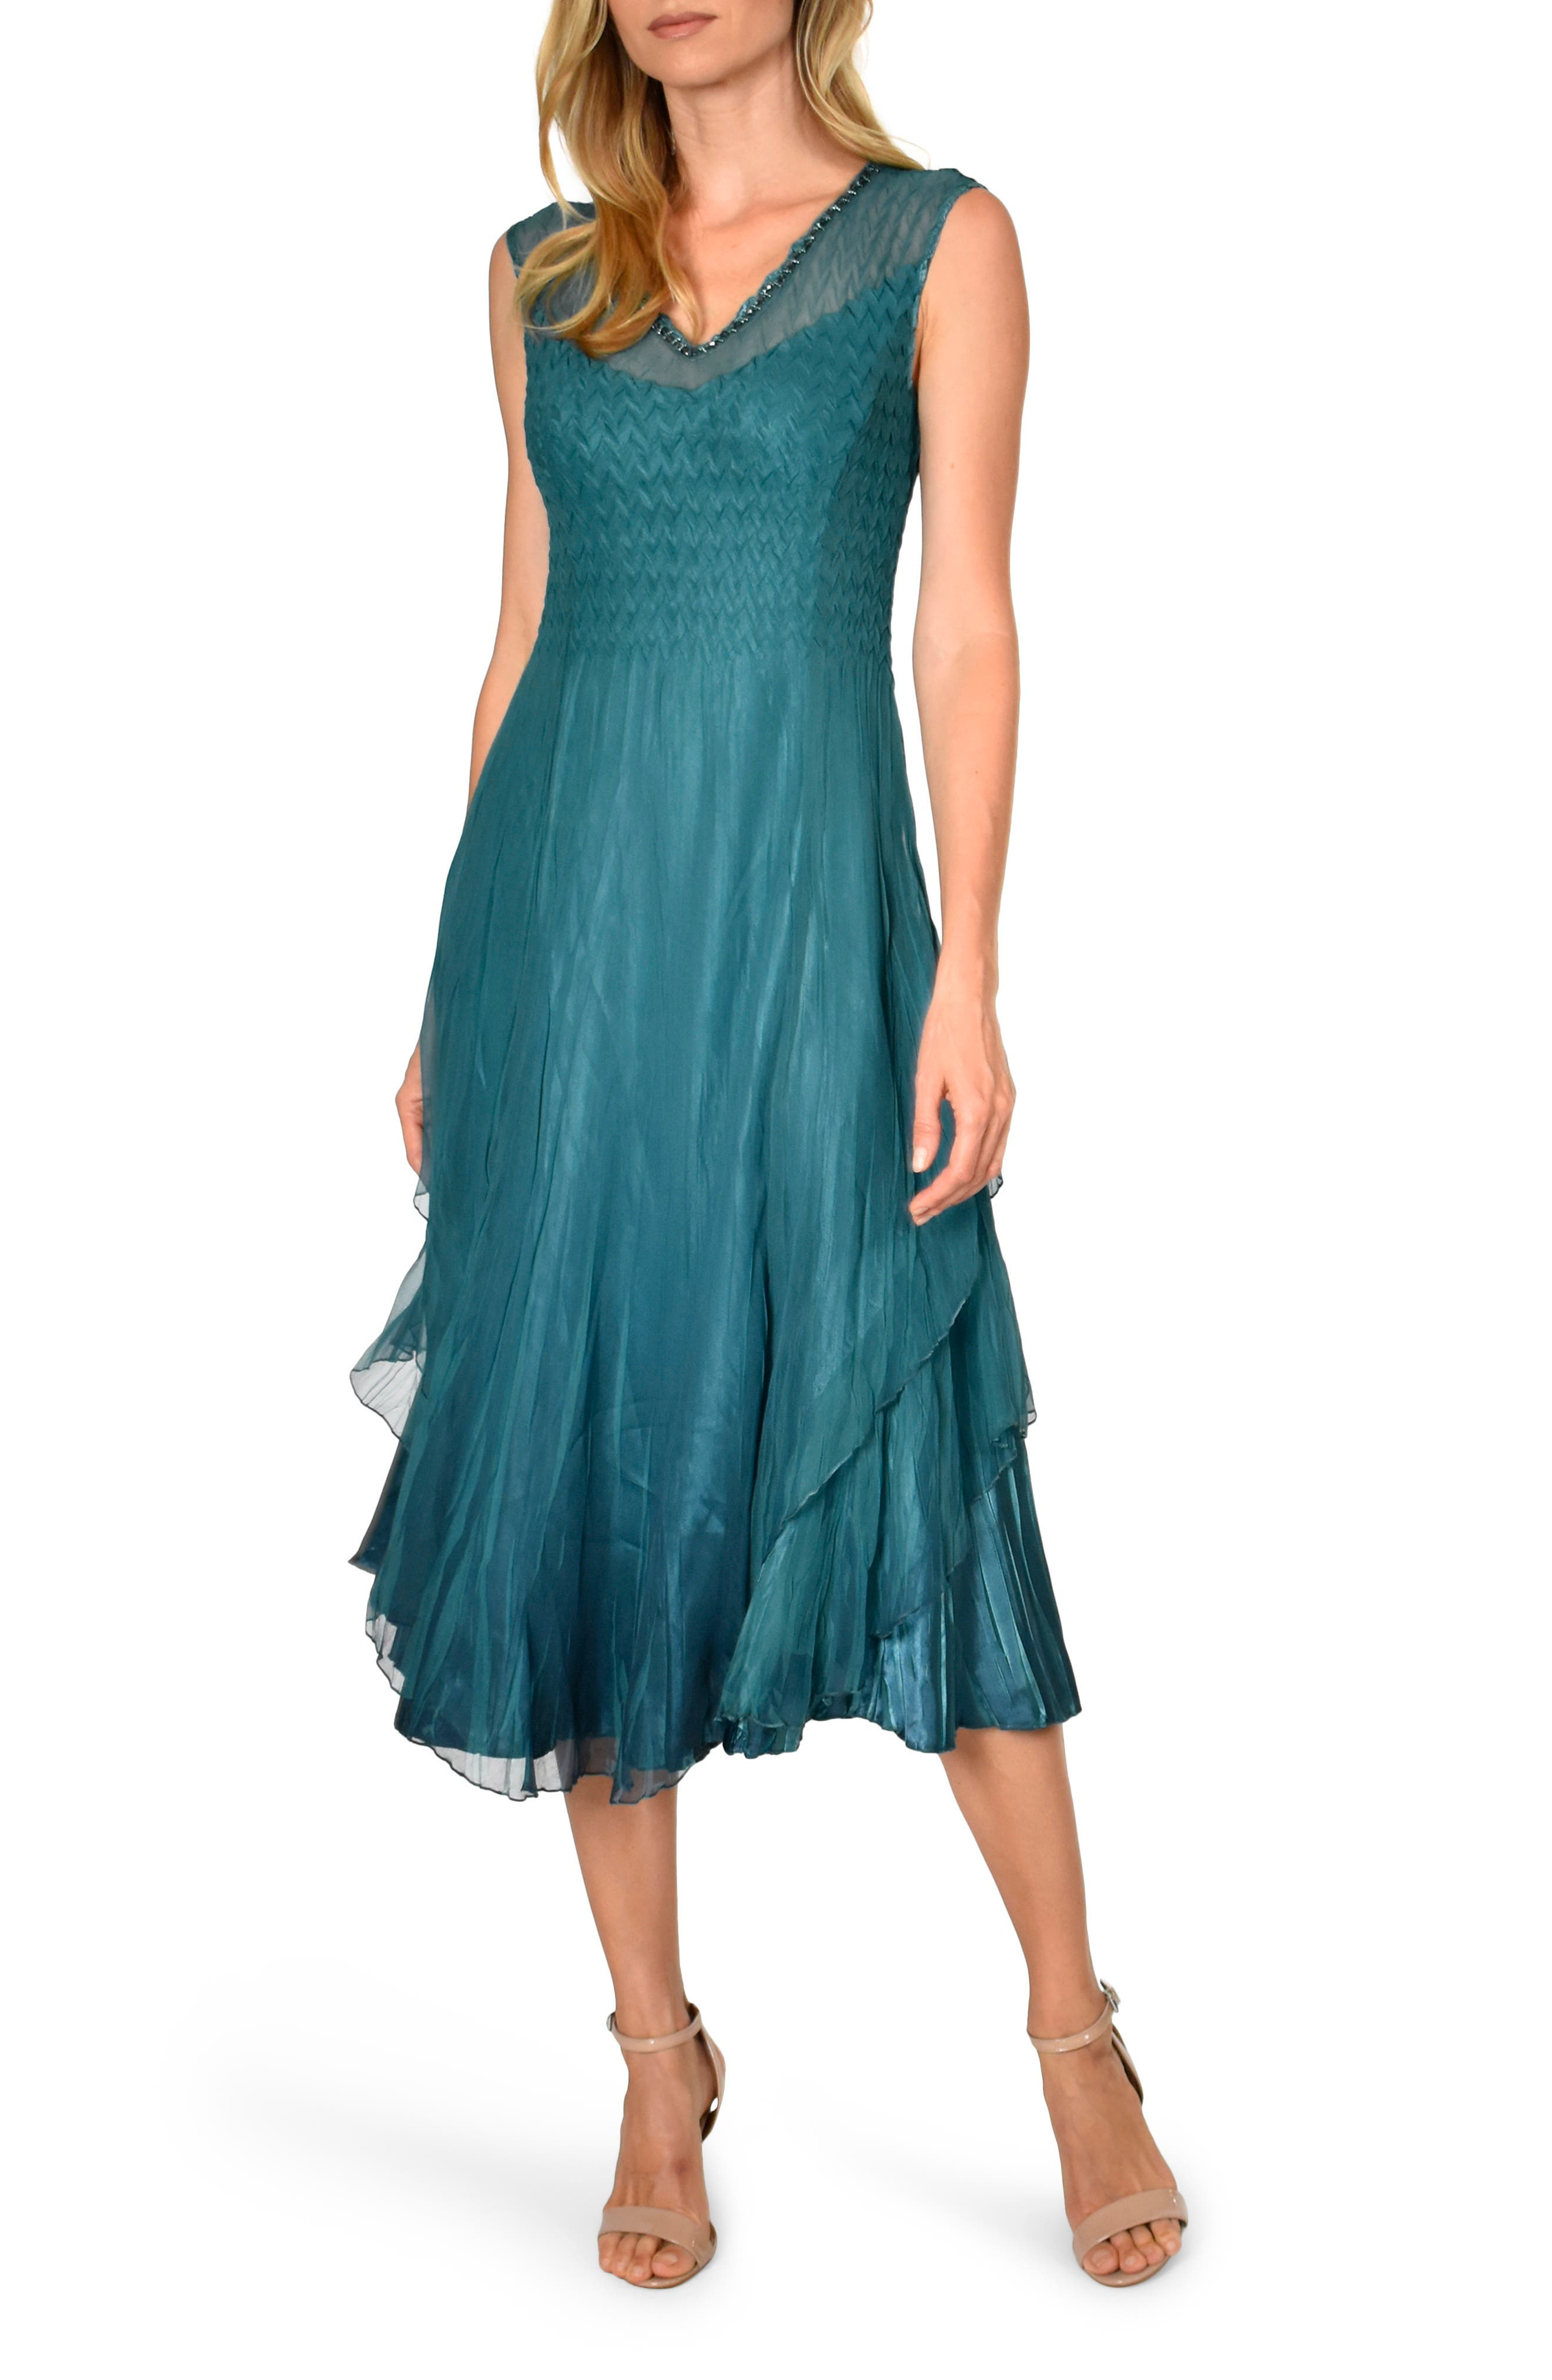 1920s Style Dresses, 20s Dresses Womens Komarov Tiered Hem Midi Dress $378.00 AT vintagedancer.com